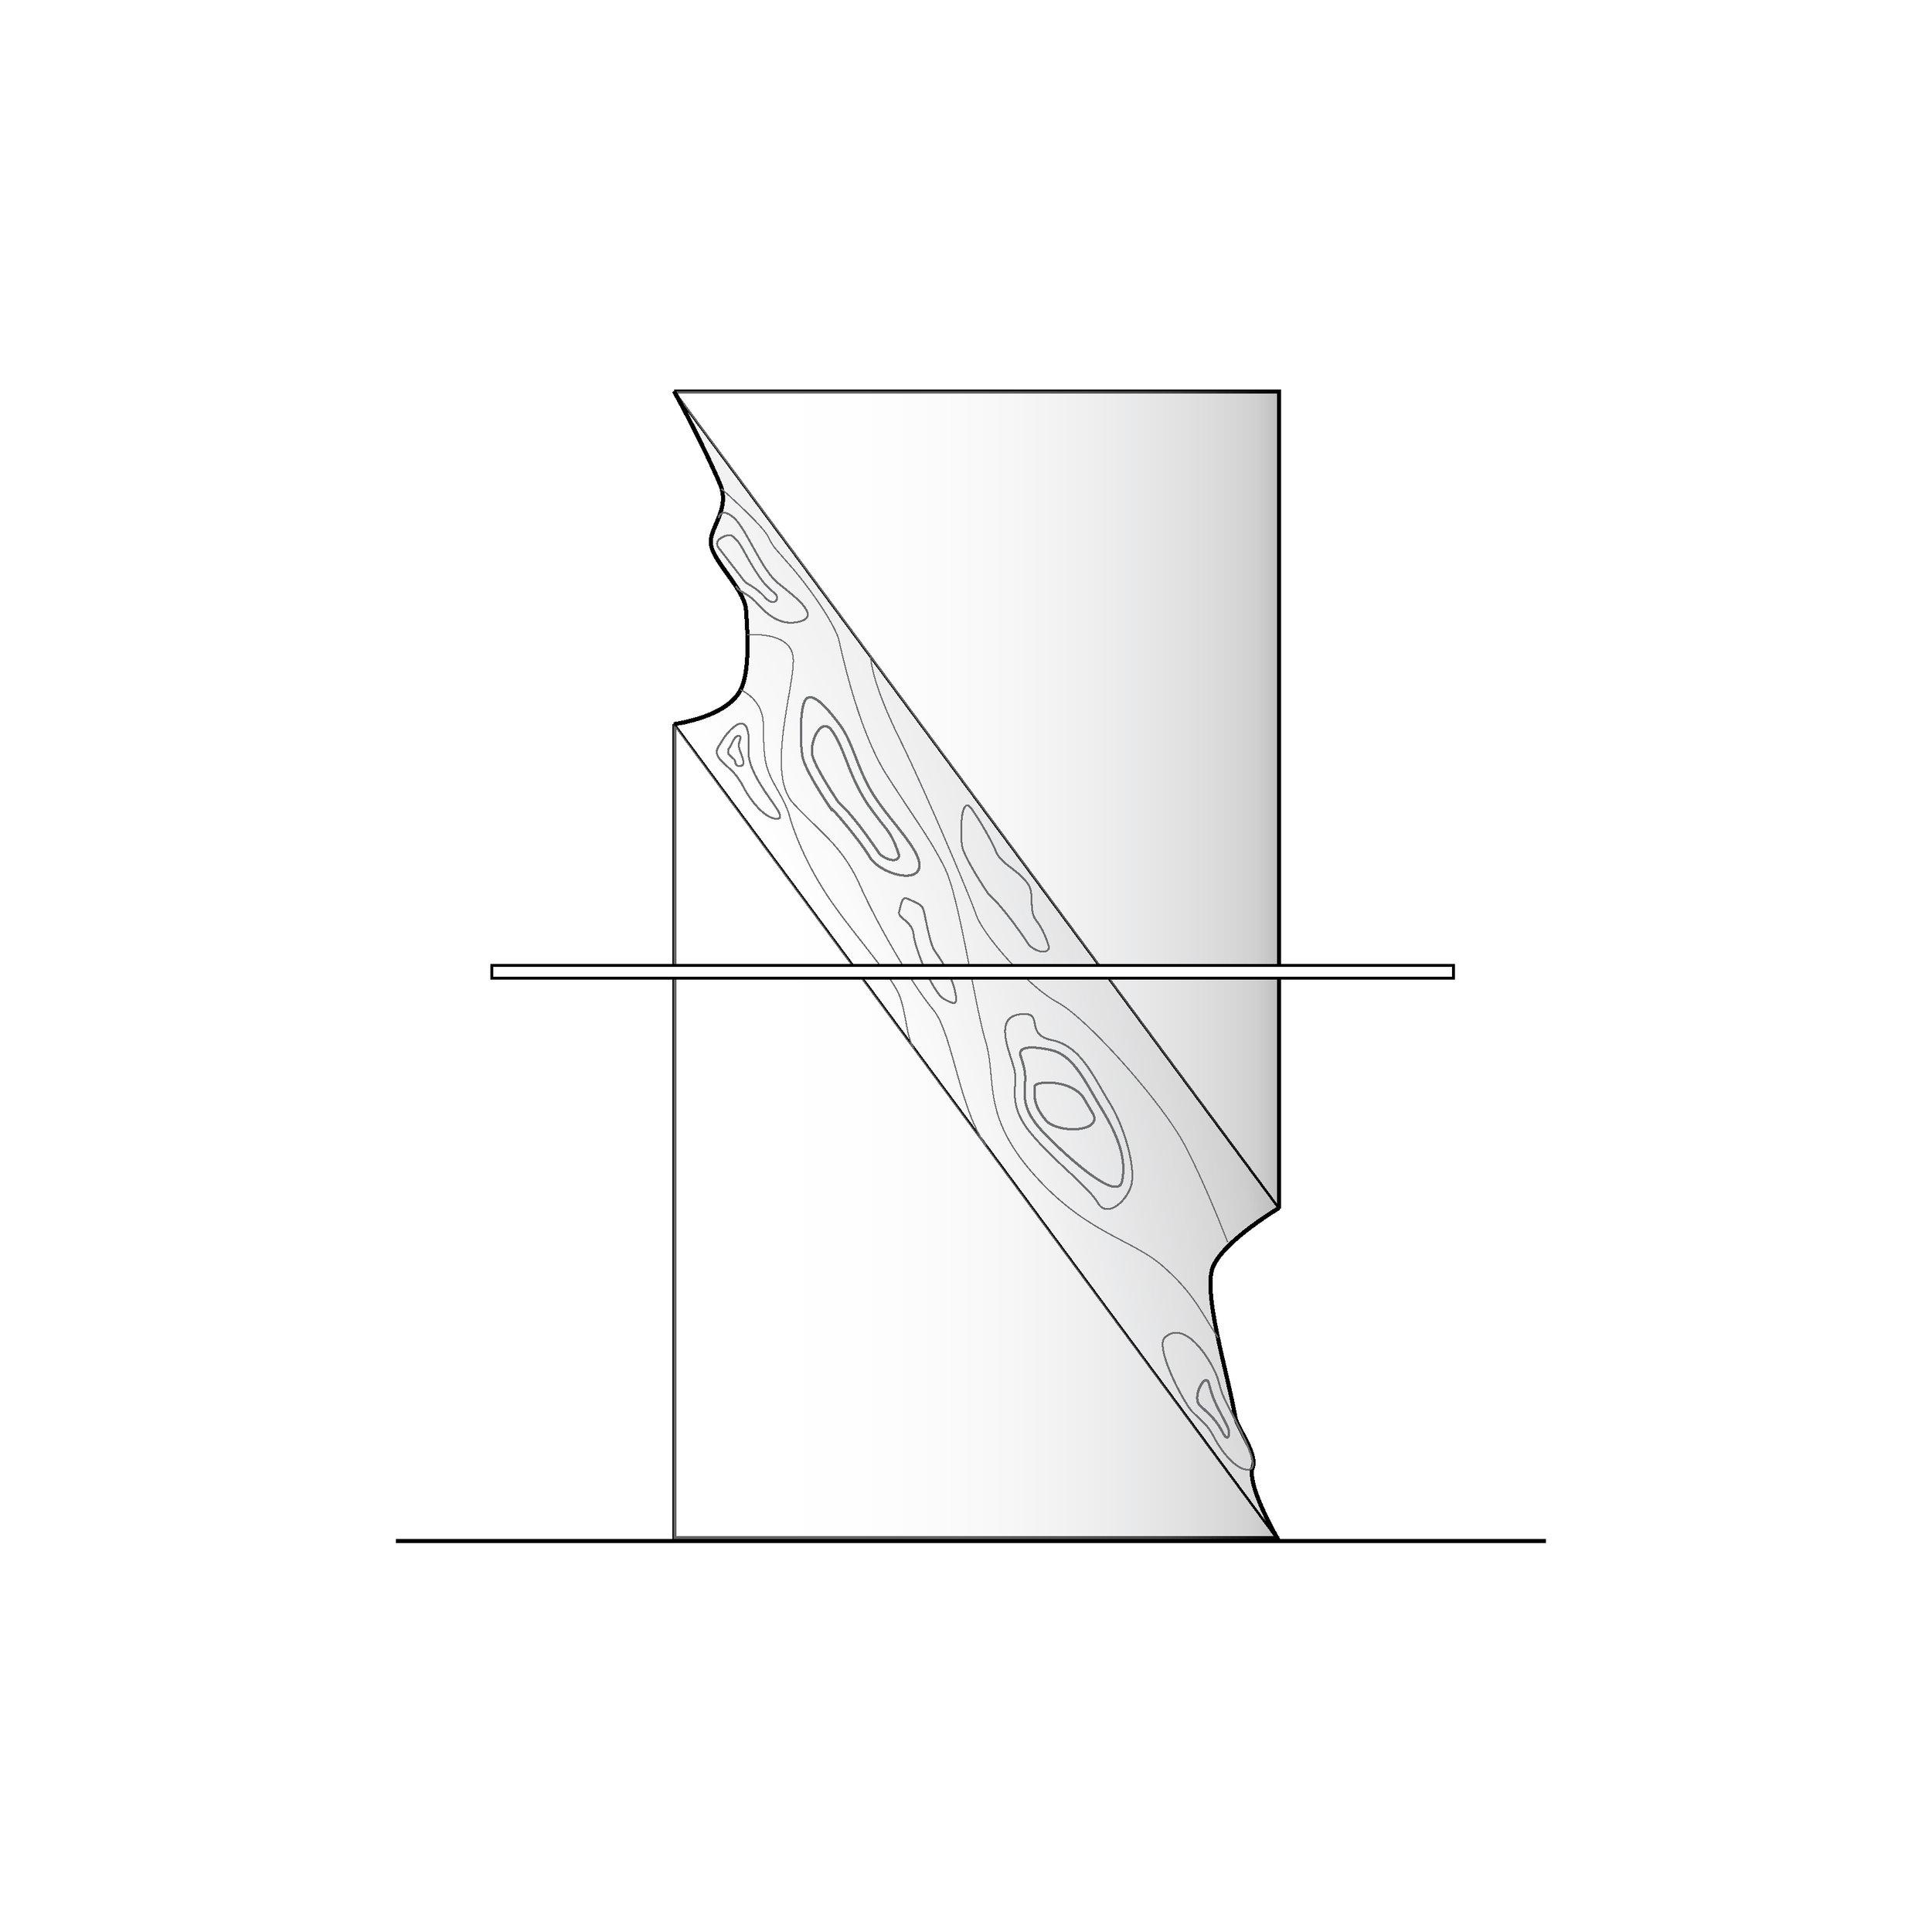 Linework Icons Squares - Furniture-02-Gradient-02.jpeg